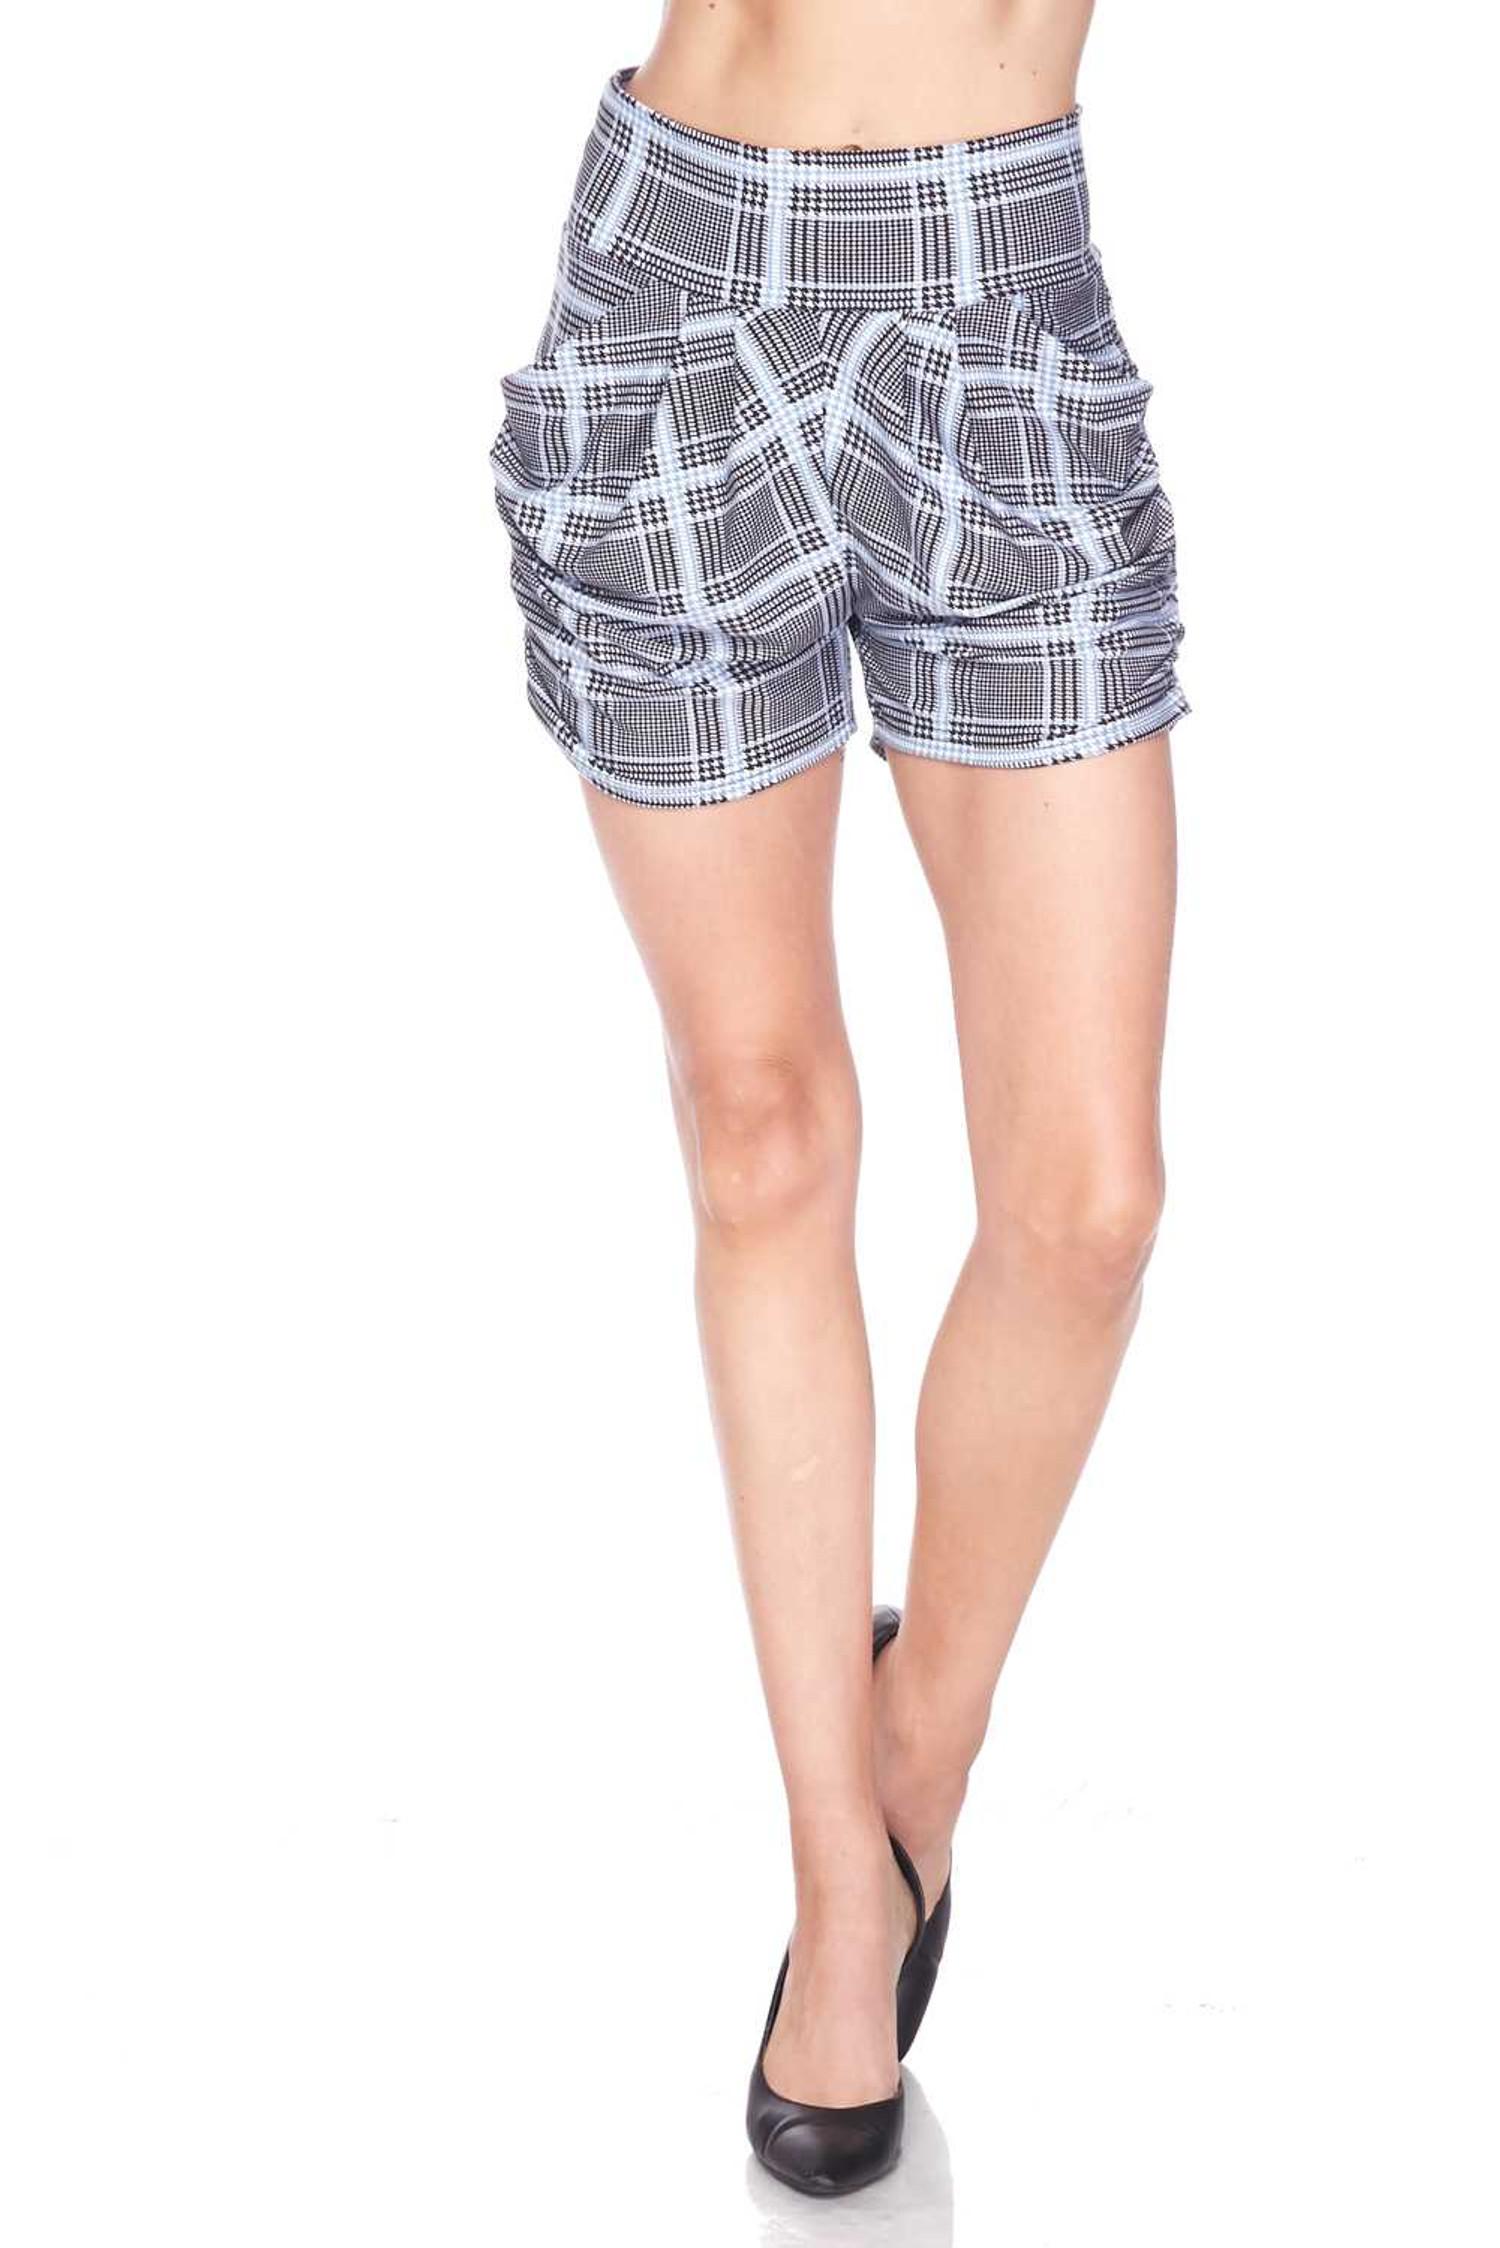 Buttery Soft Baby Blue Glen Plaid Harem Plus Size Shorts